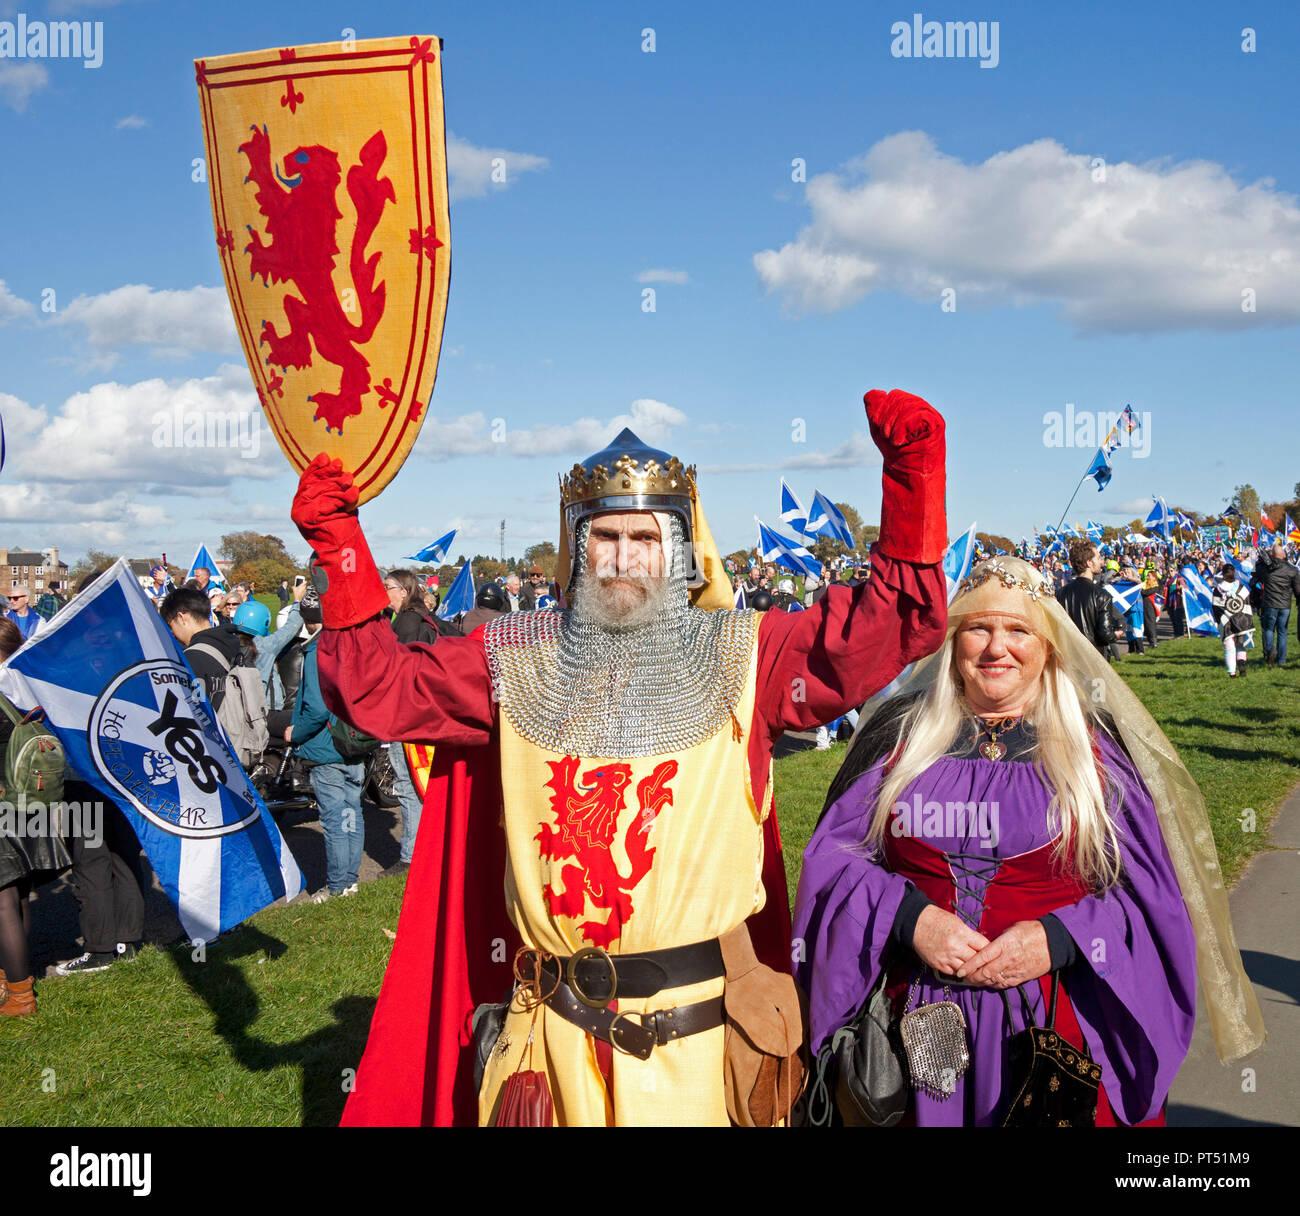 edinburgh-scotland-uk-6th-october-2018-a